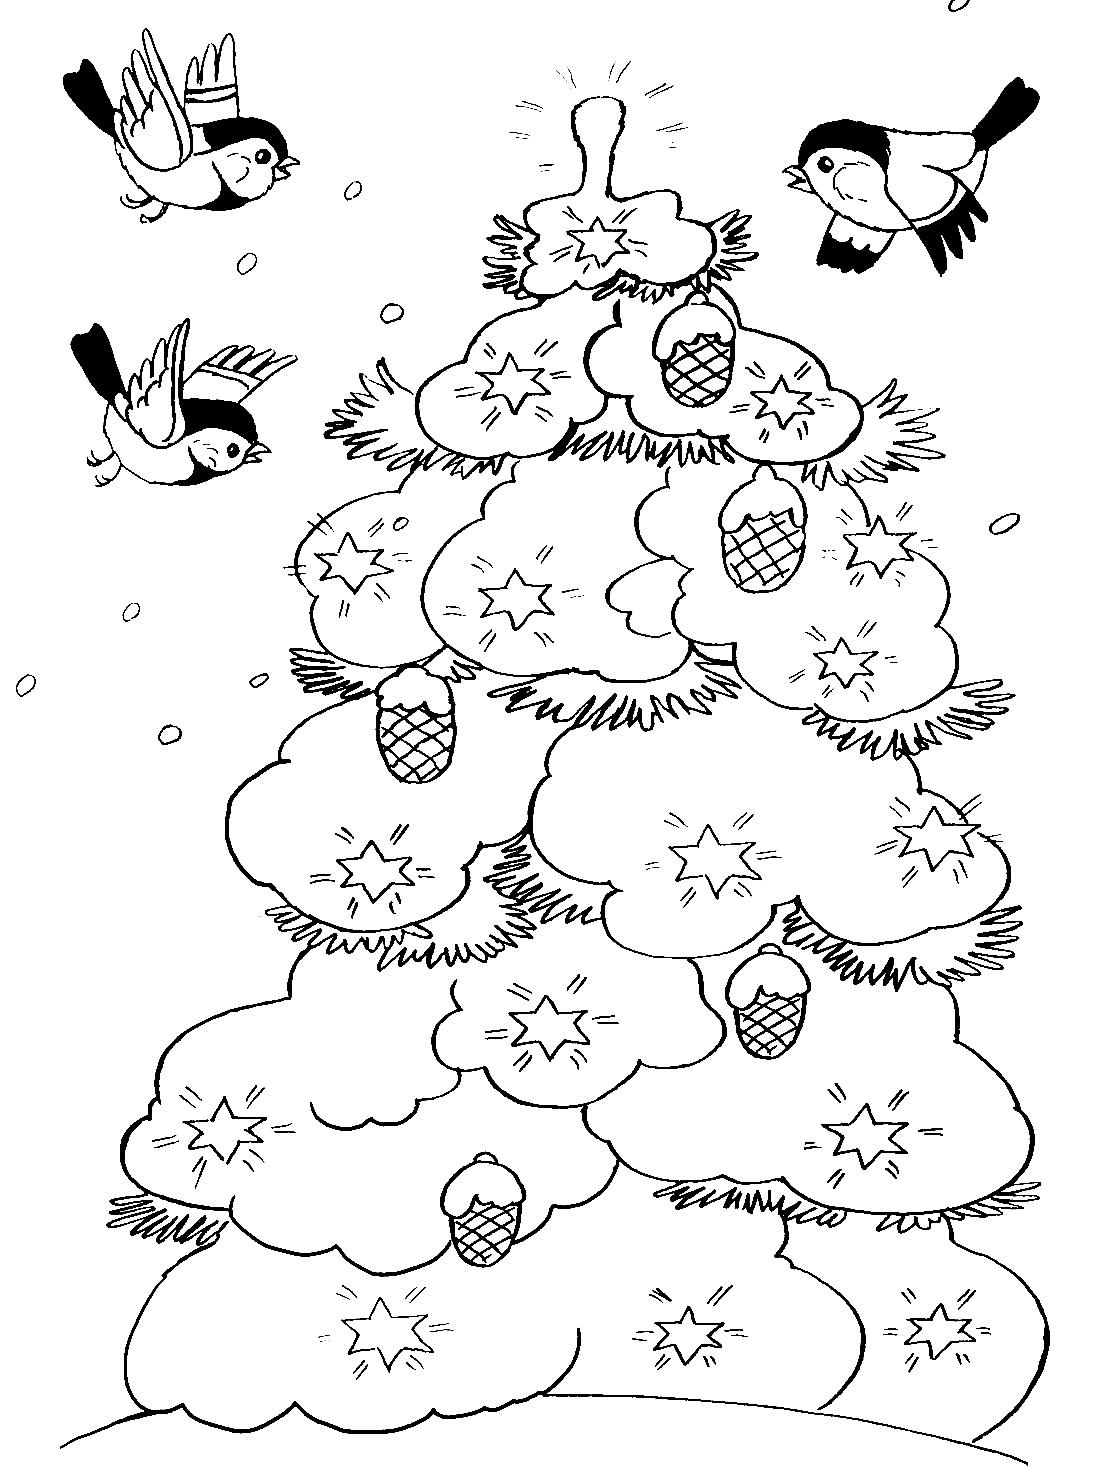 Птички и елка зимой в лесу - раскраска №8659 | Printonic.ru